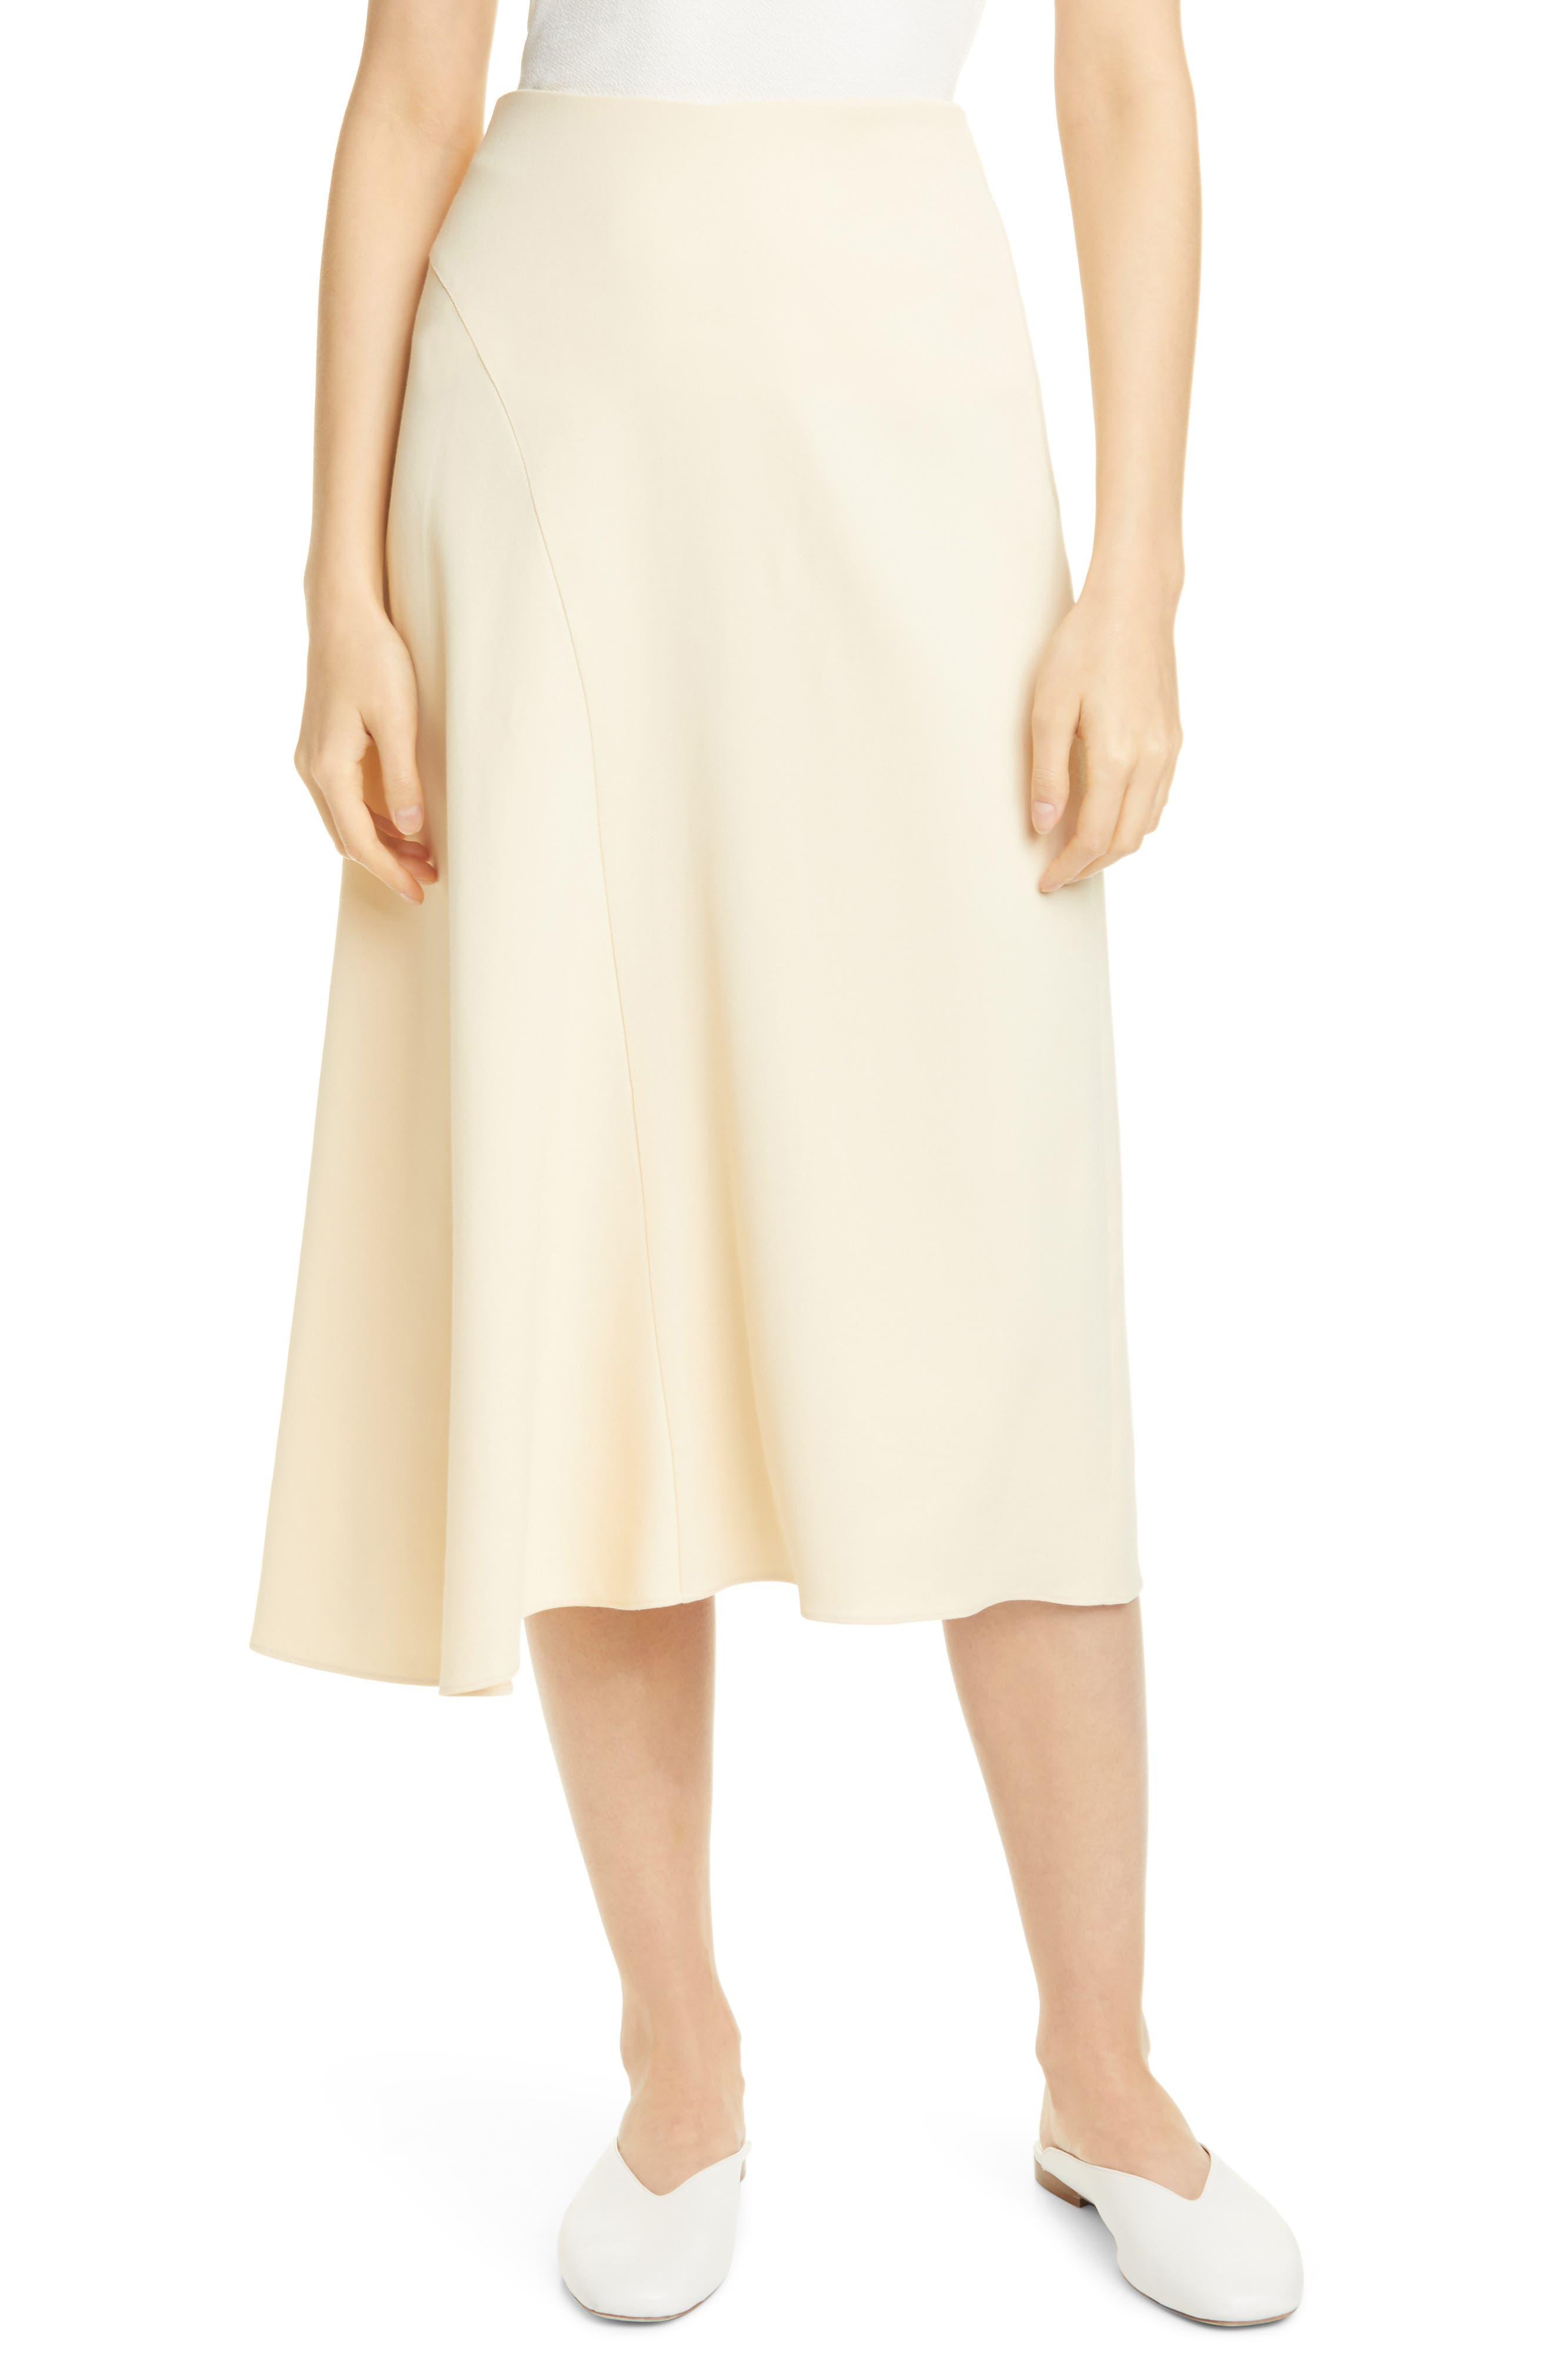 1930s Style Skirts : Midi Skirts, Tea Length, Pleated Vince Asymmetrical Seam Midi Skirt Size 12 - Naples Sun at Nordstrom Rack $139.97 AT vintagedancer.com